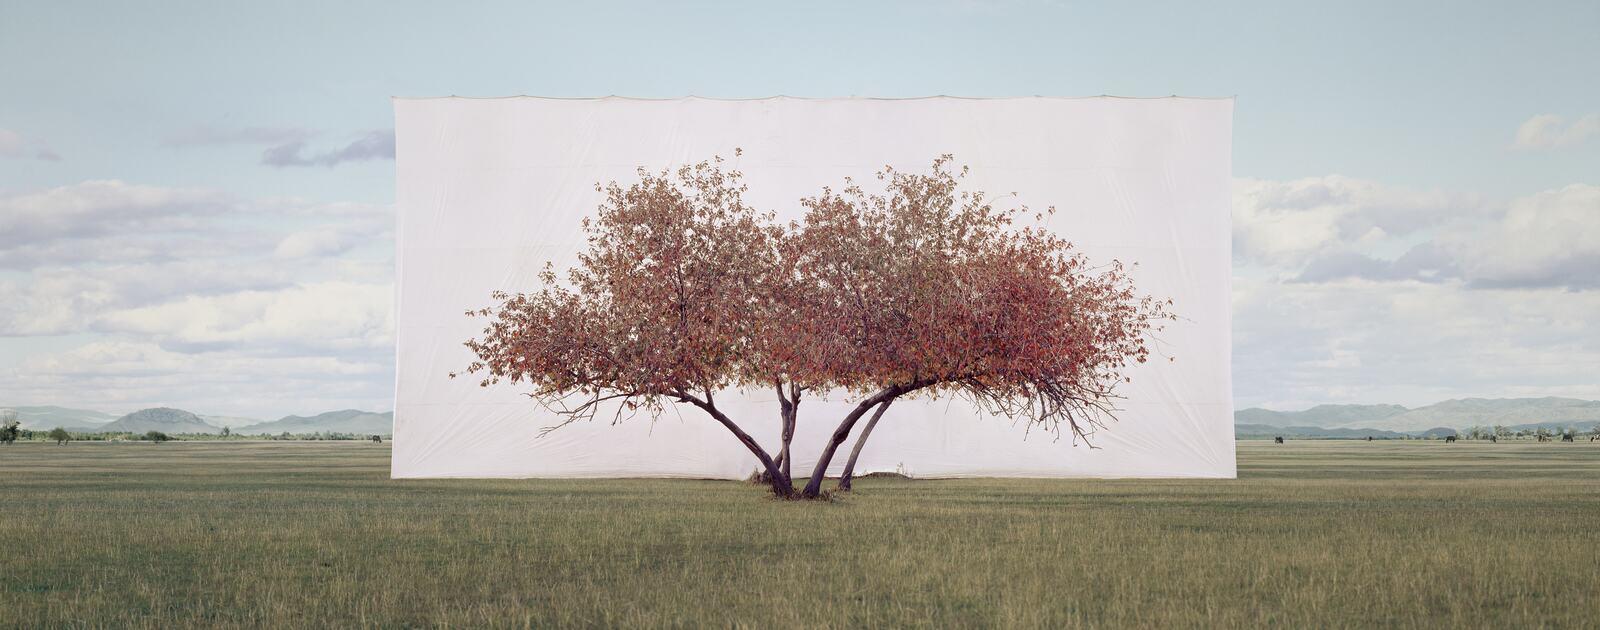 Myoung Ho Lee, Tree... #2, 2012. ©️ the artist. Courtesy Myoung Ho Lee and Gallery Hyundai.